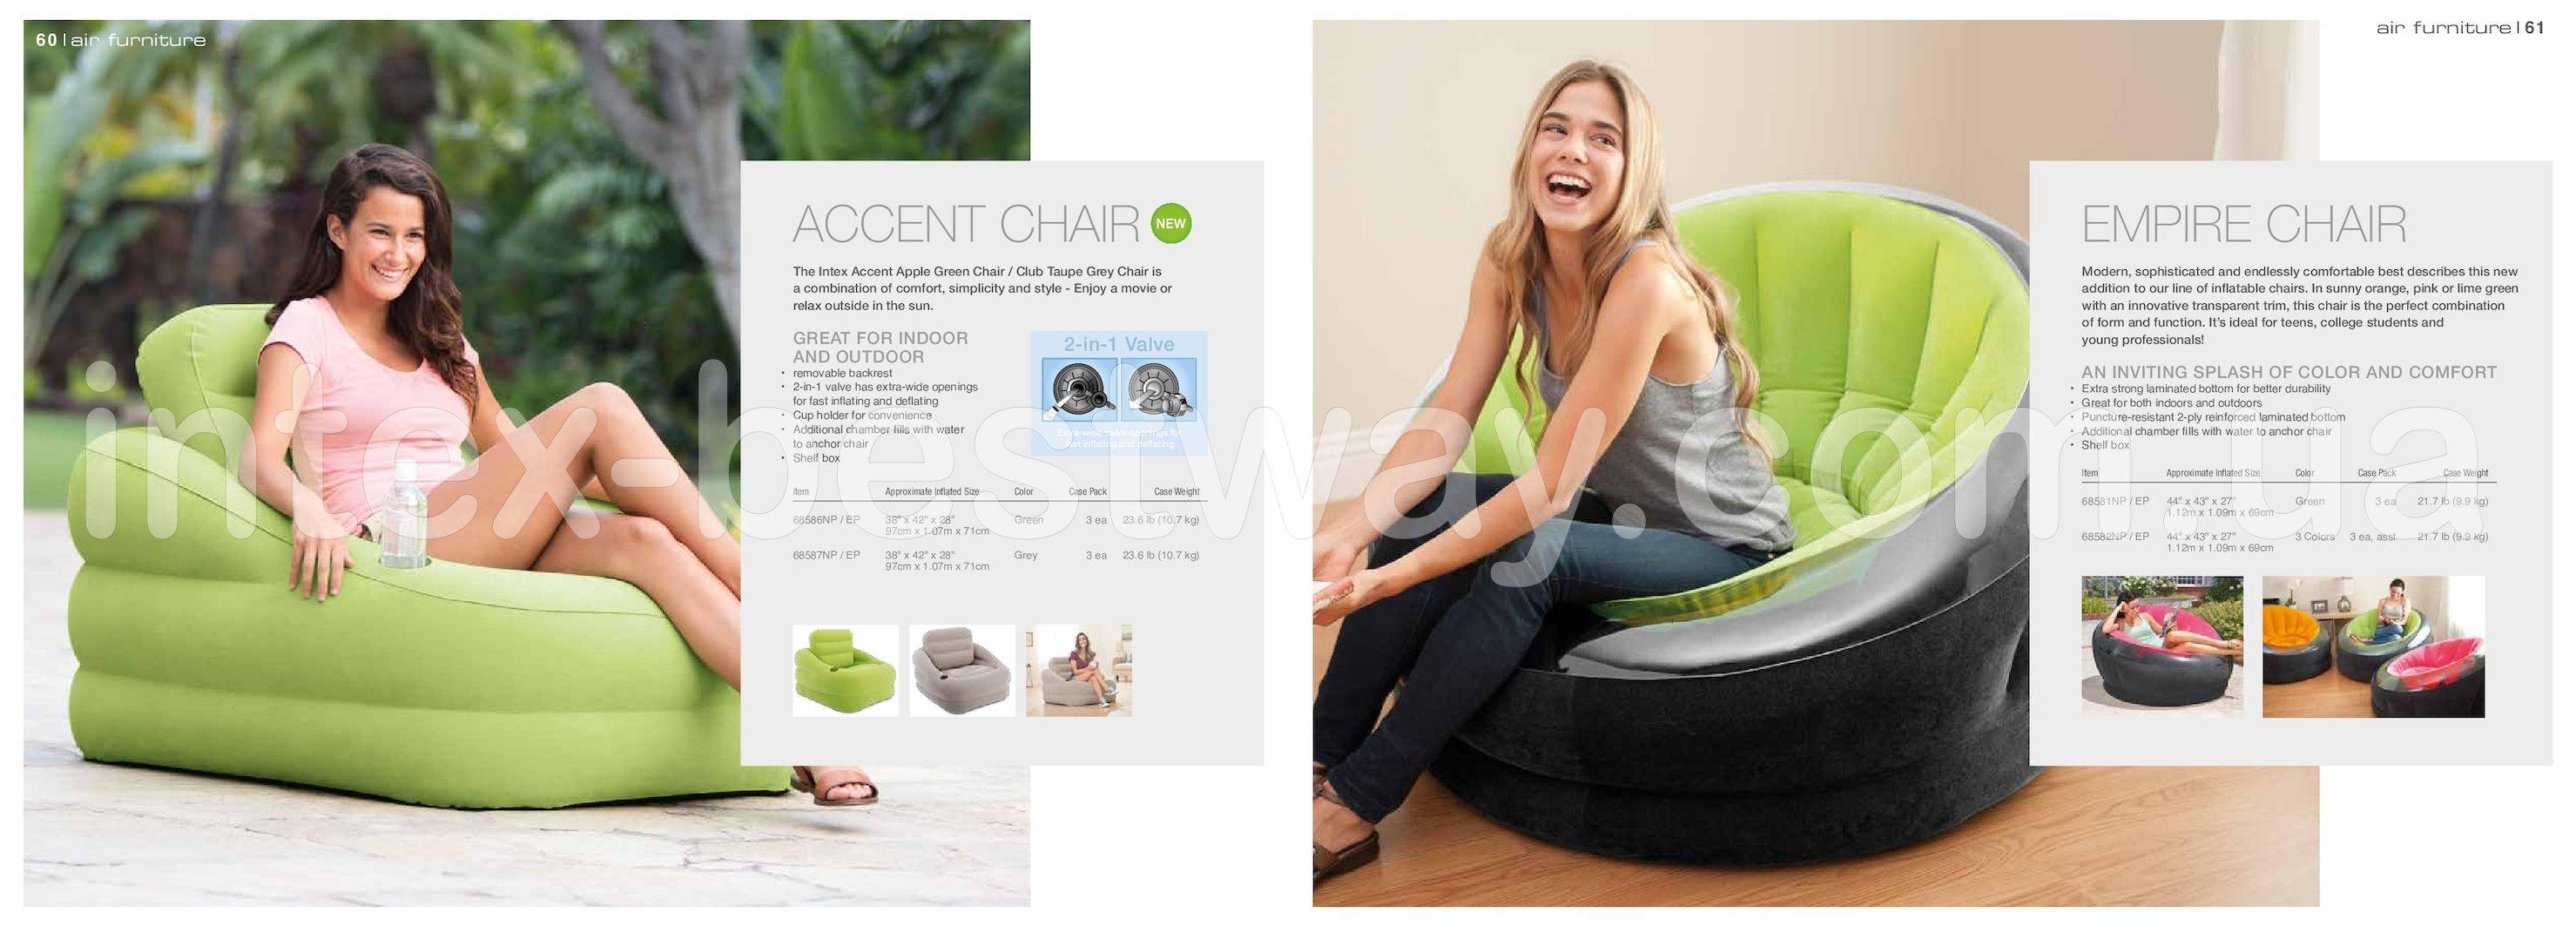 Надувное кресло Intex 68586 Accent Chair